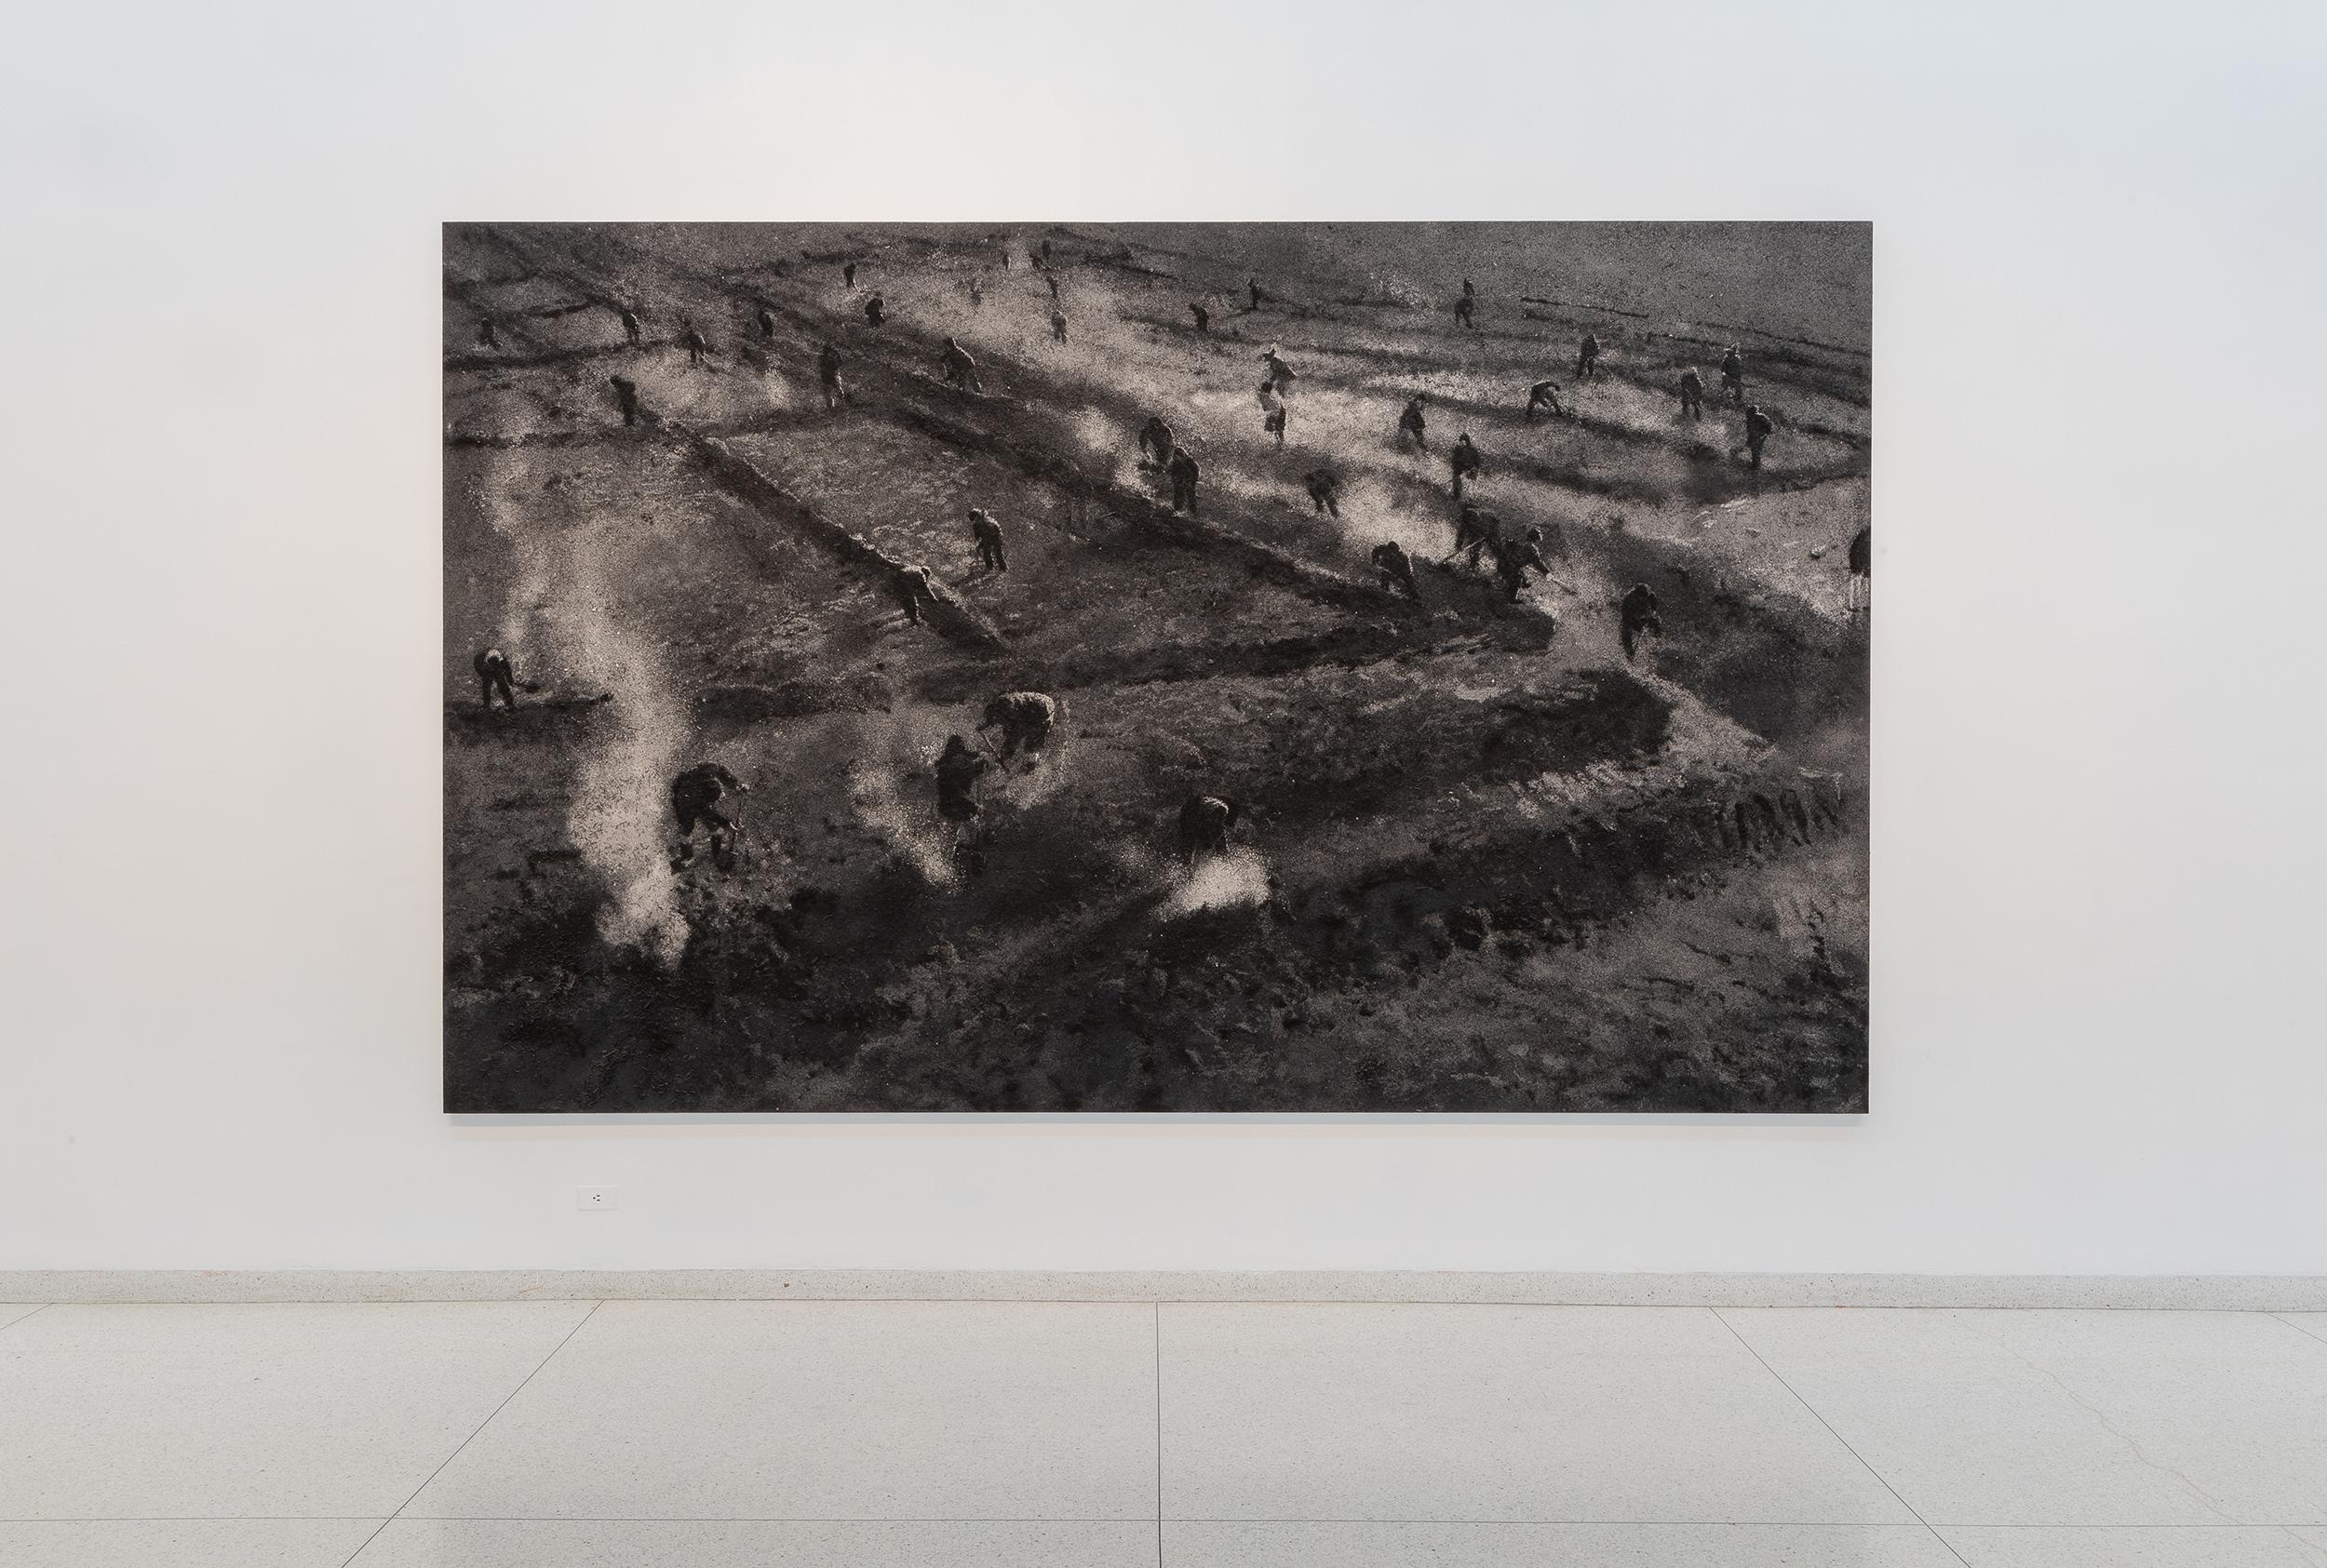 Zhang Huan, Seeds, 2007